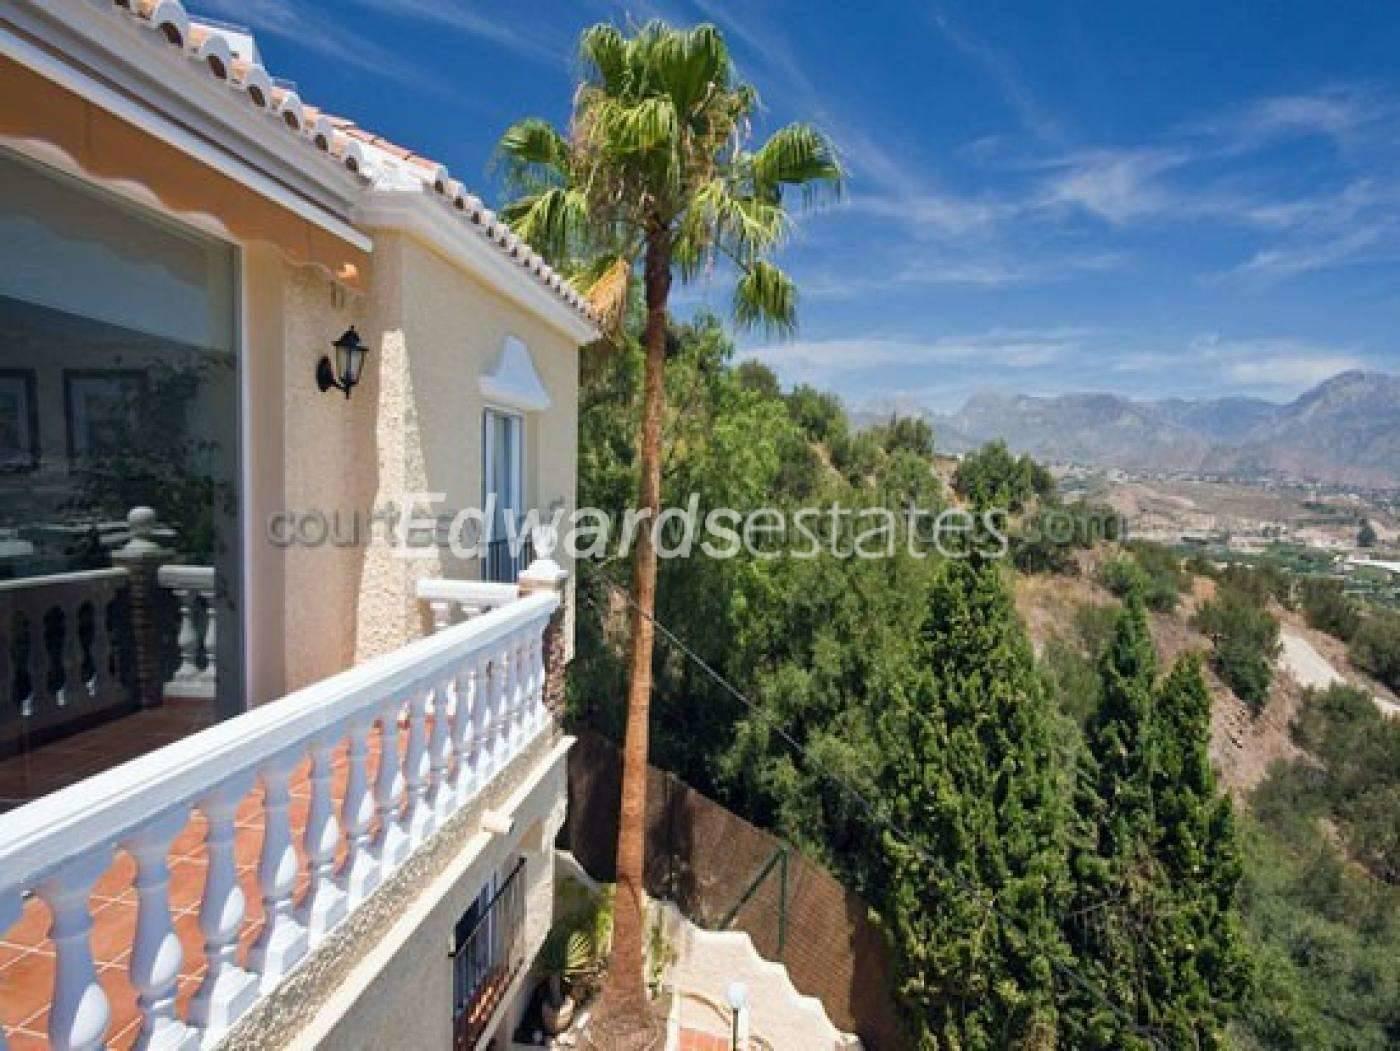 4 bedroom Villa for sale in Nerja with pool - € 795,000 (Ref: 3088233)